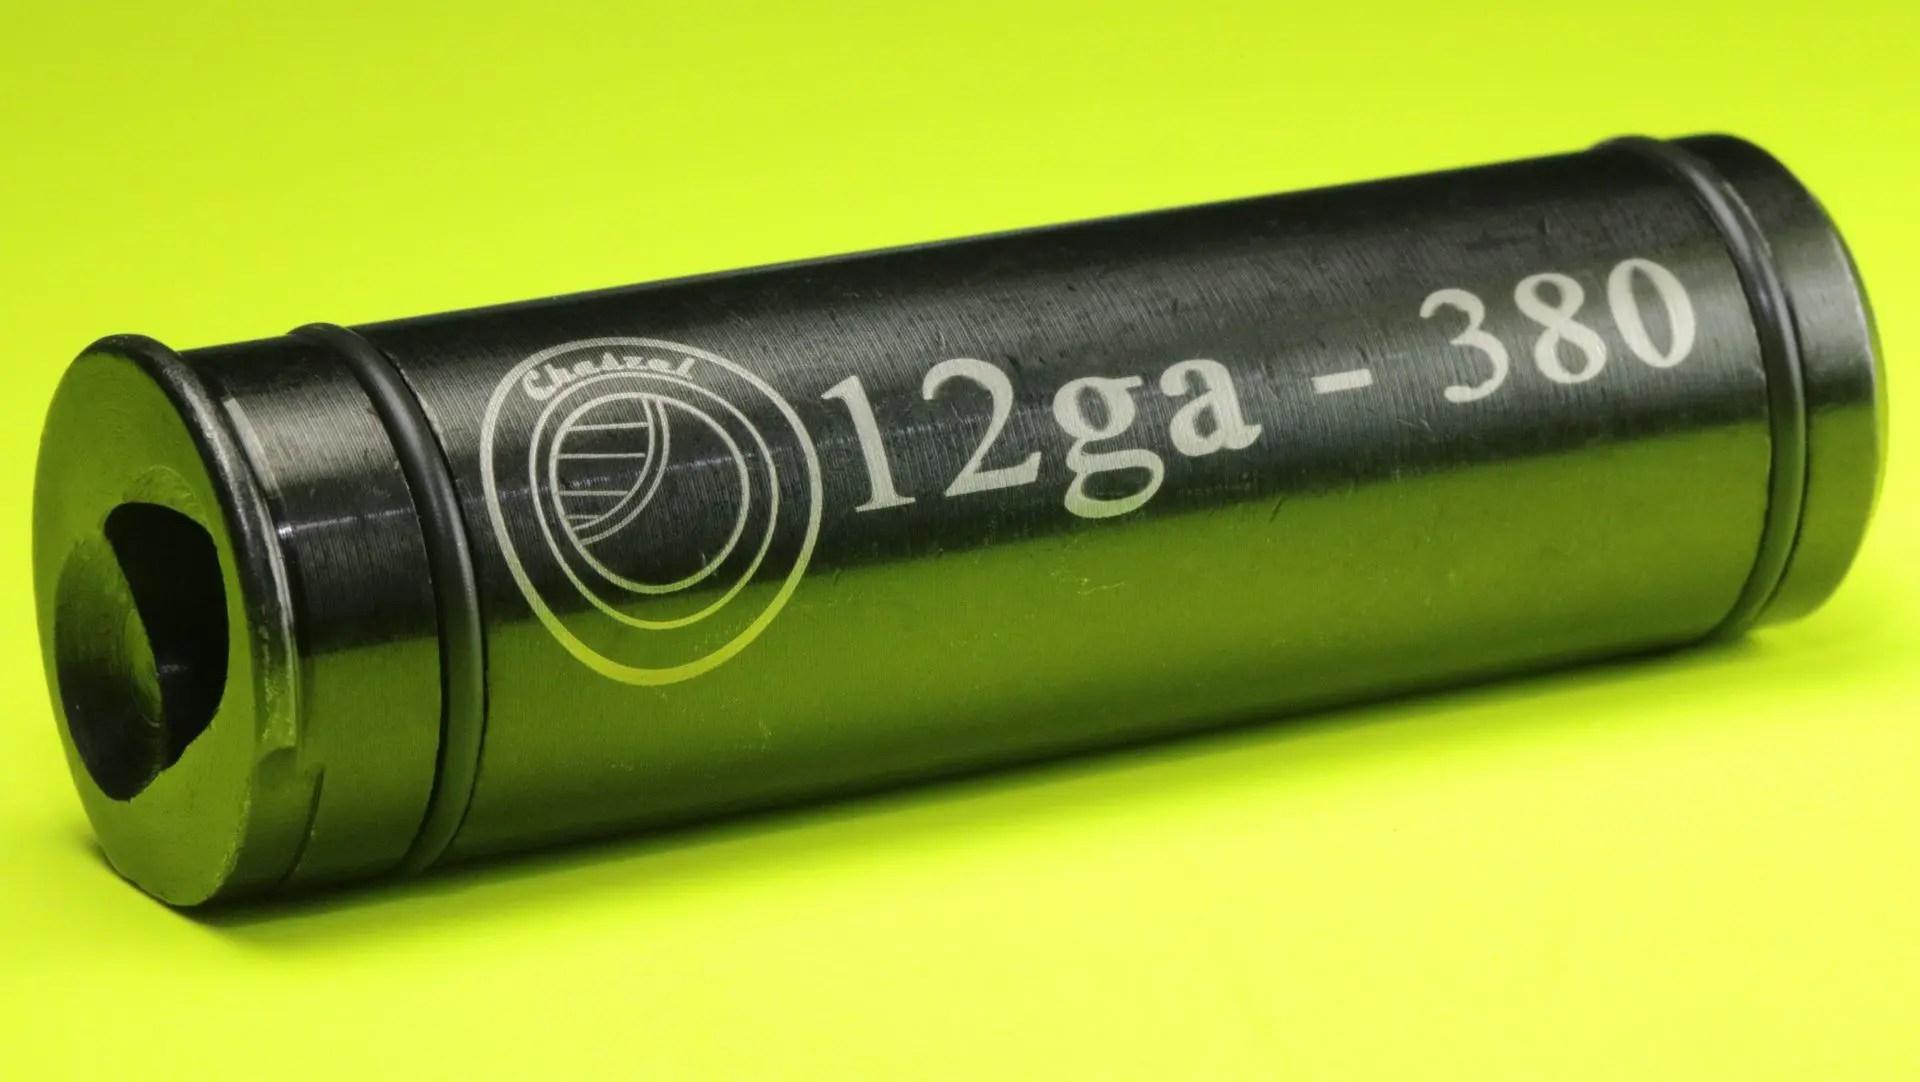 "Chaszel 12 Gauge to 380 Shotgun Adapter 2 3/4"" Long"